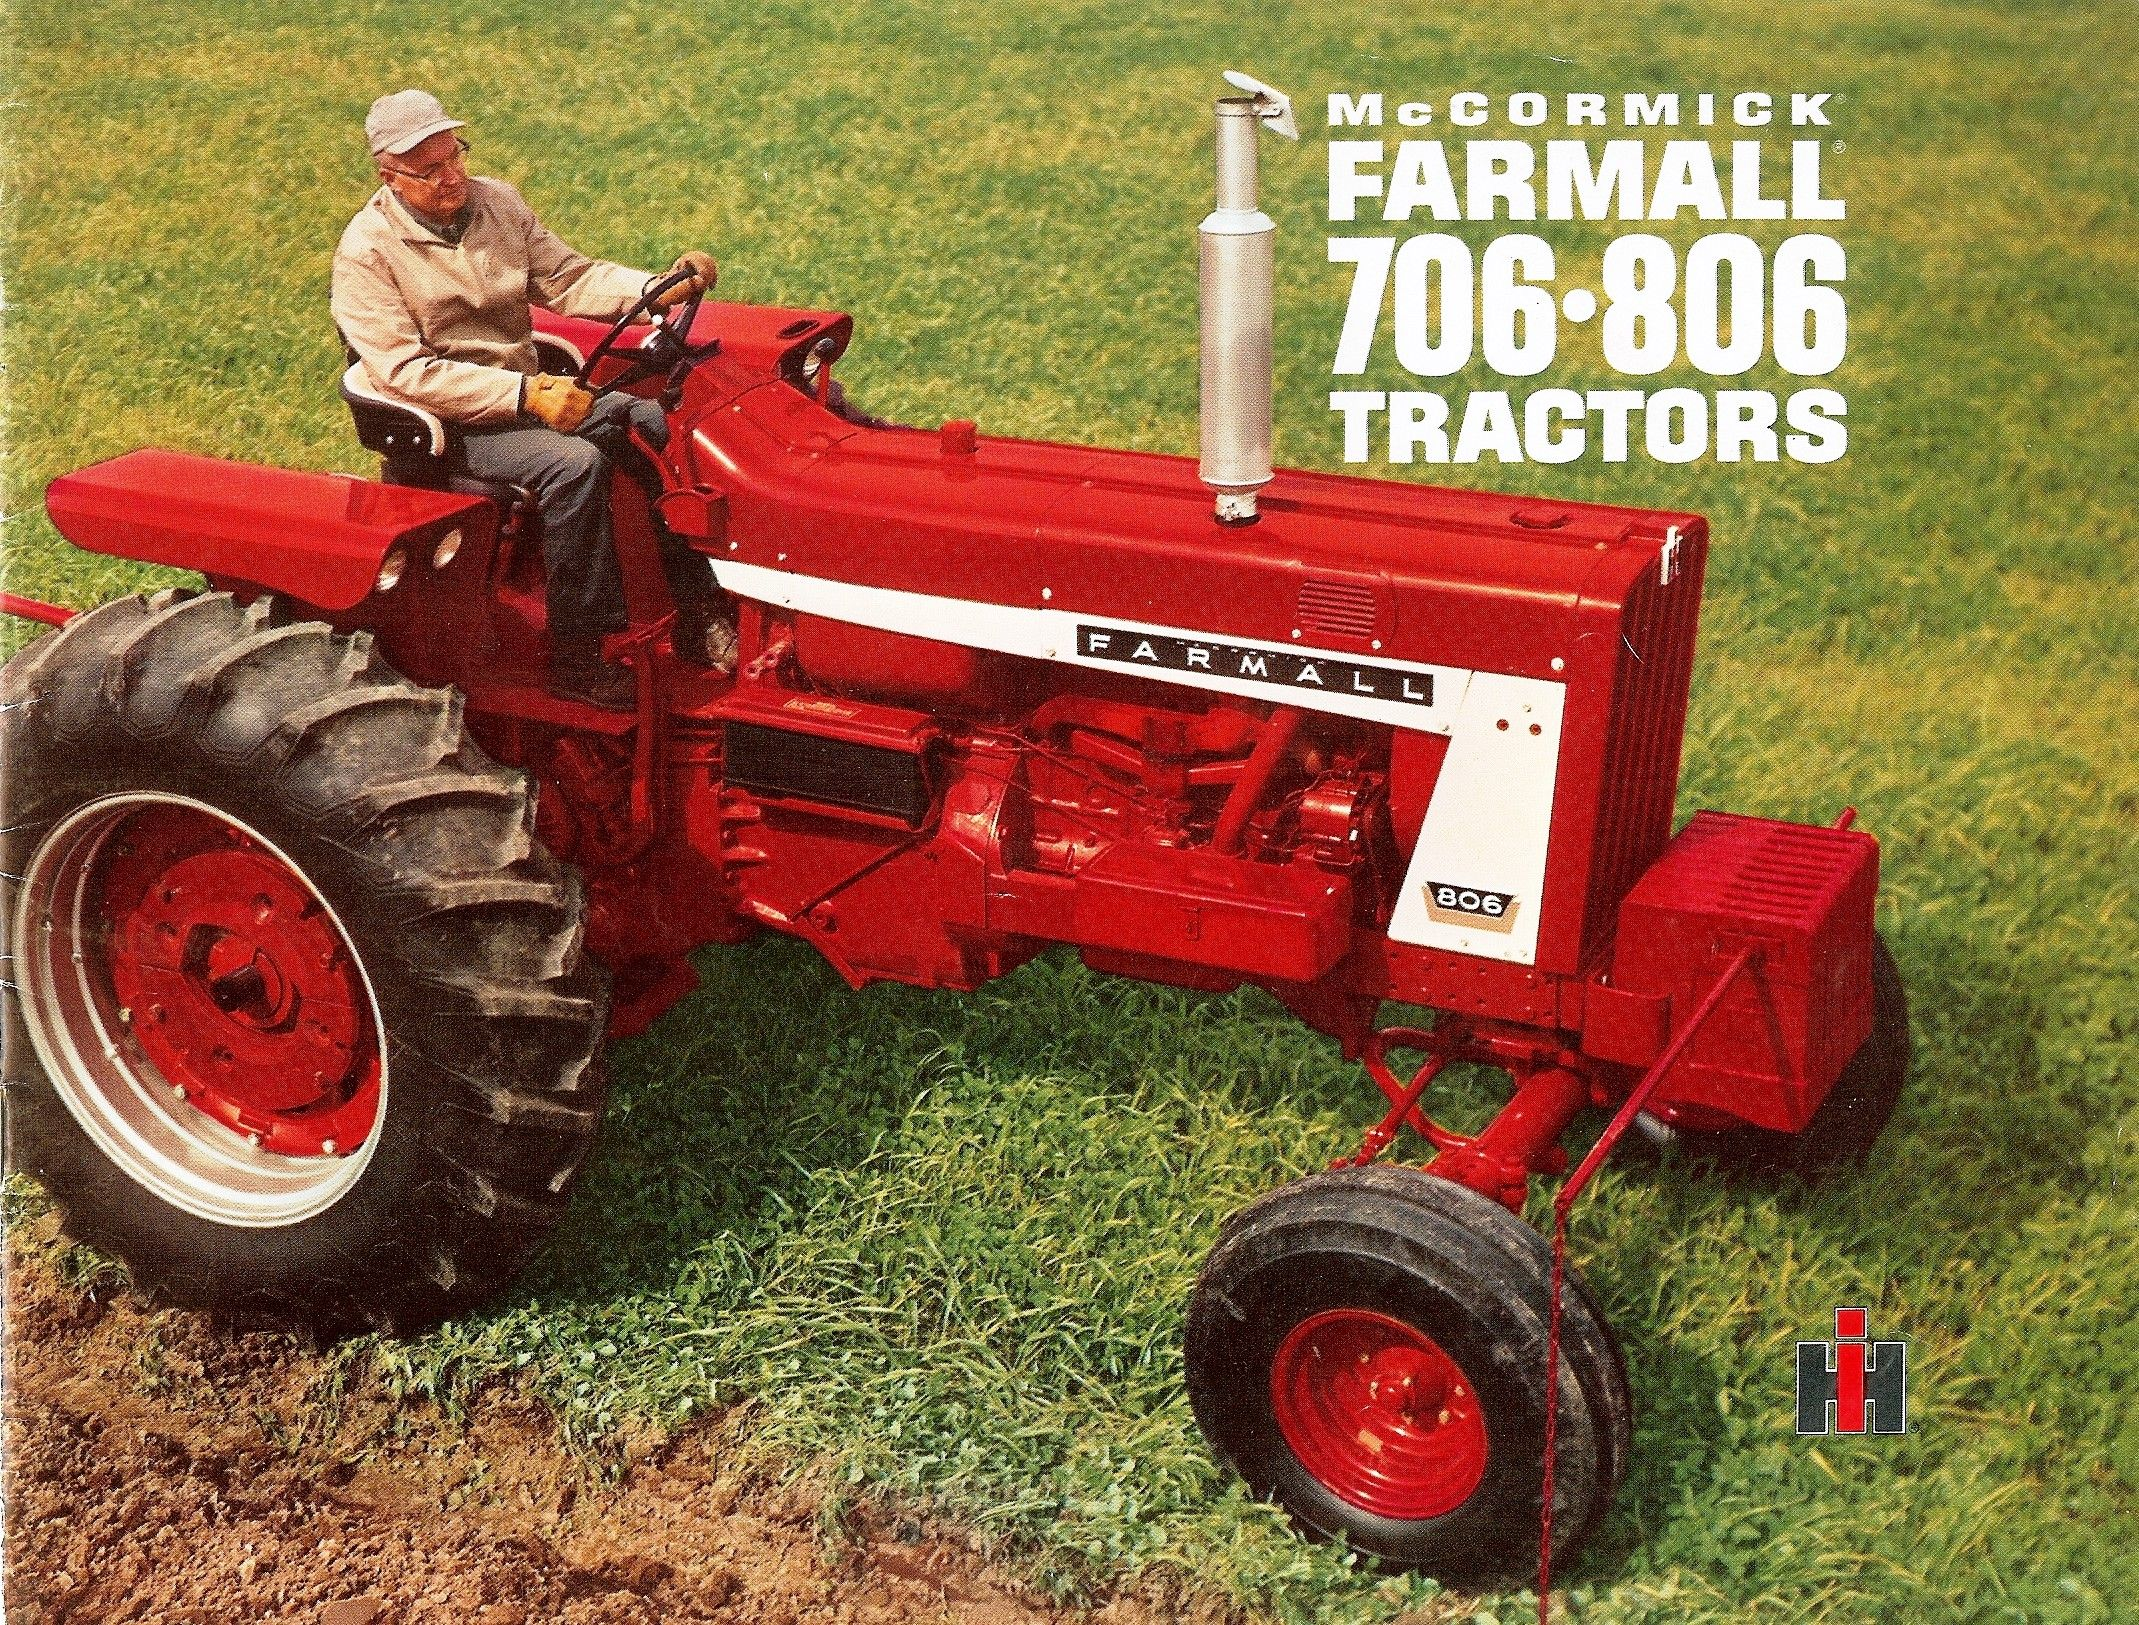 farmall 706 806 tractors international harvester advertising set also 806 farmall tractor wiring harness in addition 560 farmall [ 2139 x 1625 Pixel ]